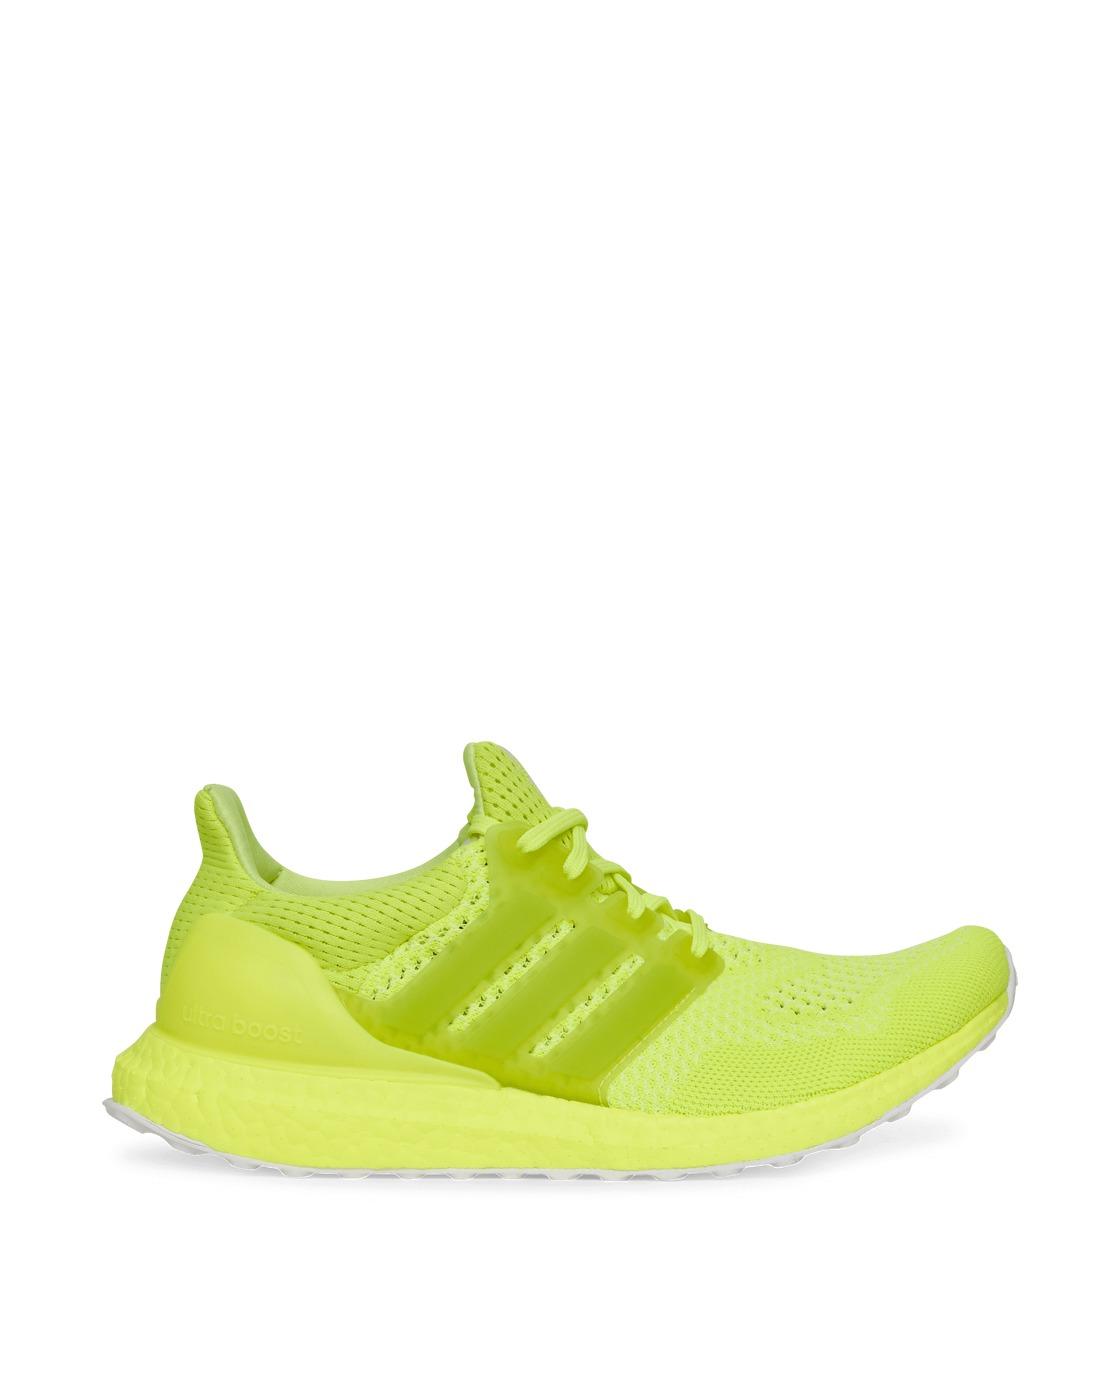 Adidas Originals Ultraboost 1.0 Dna Sneakers Solar Yellow